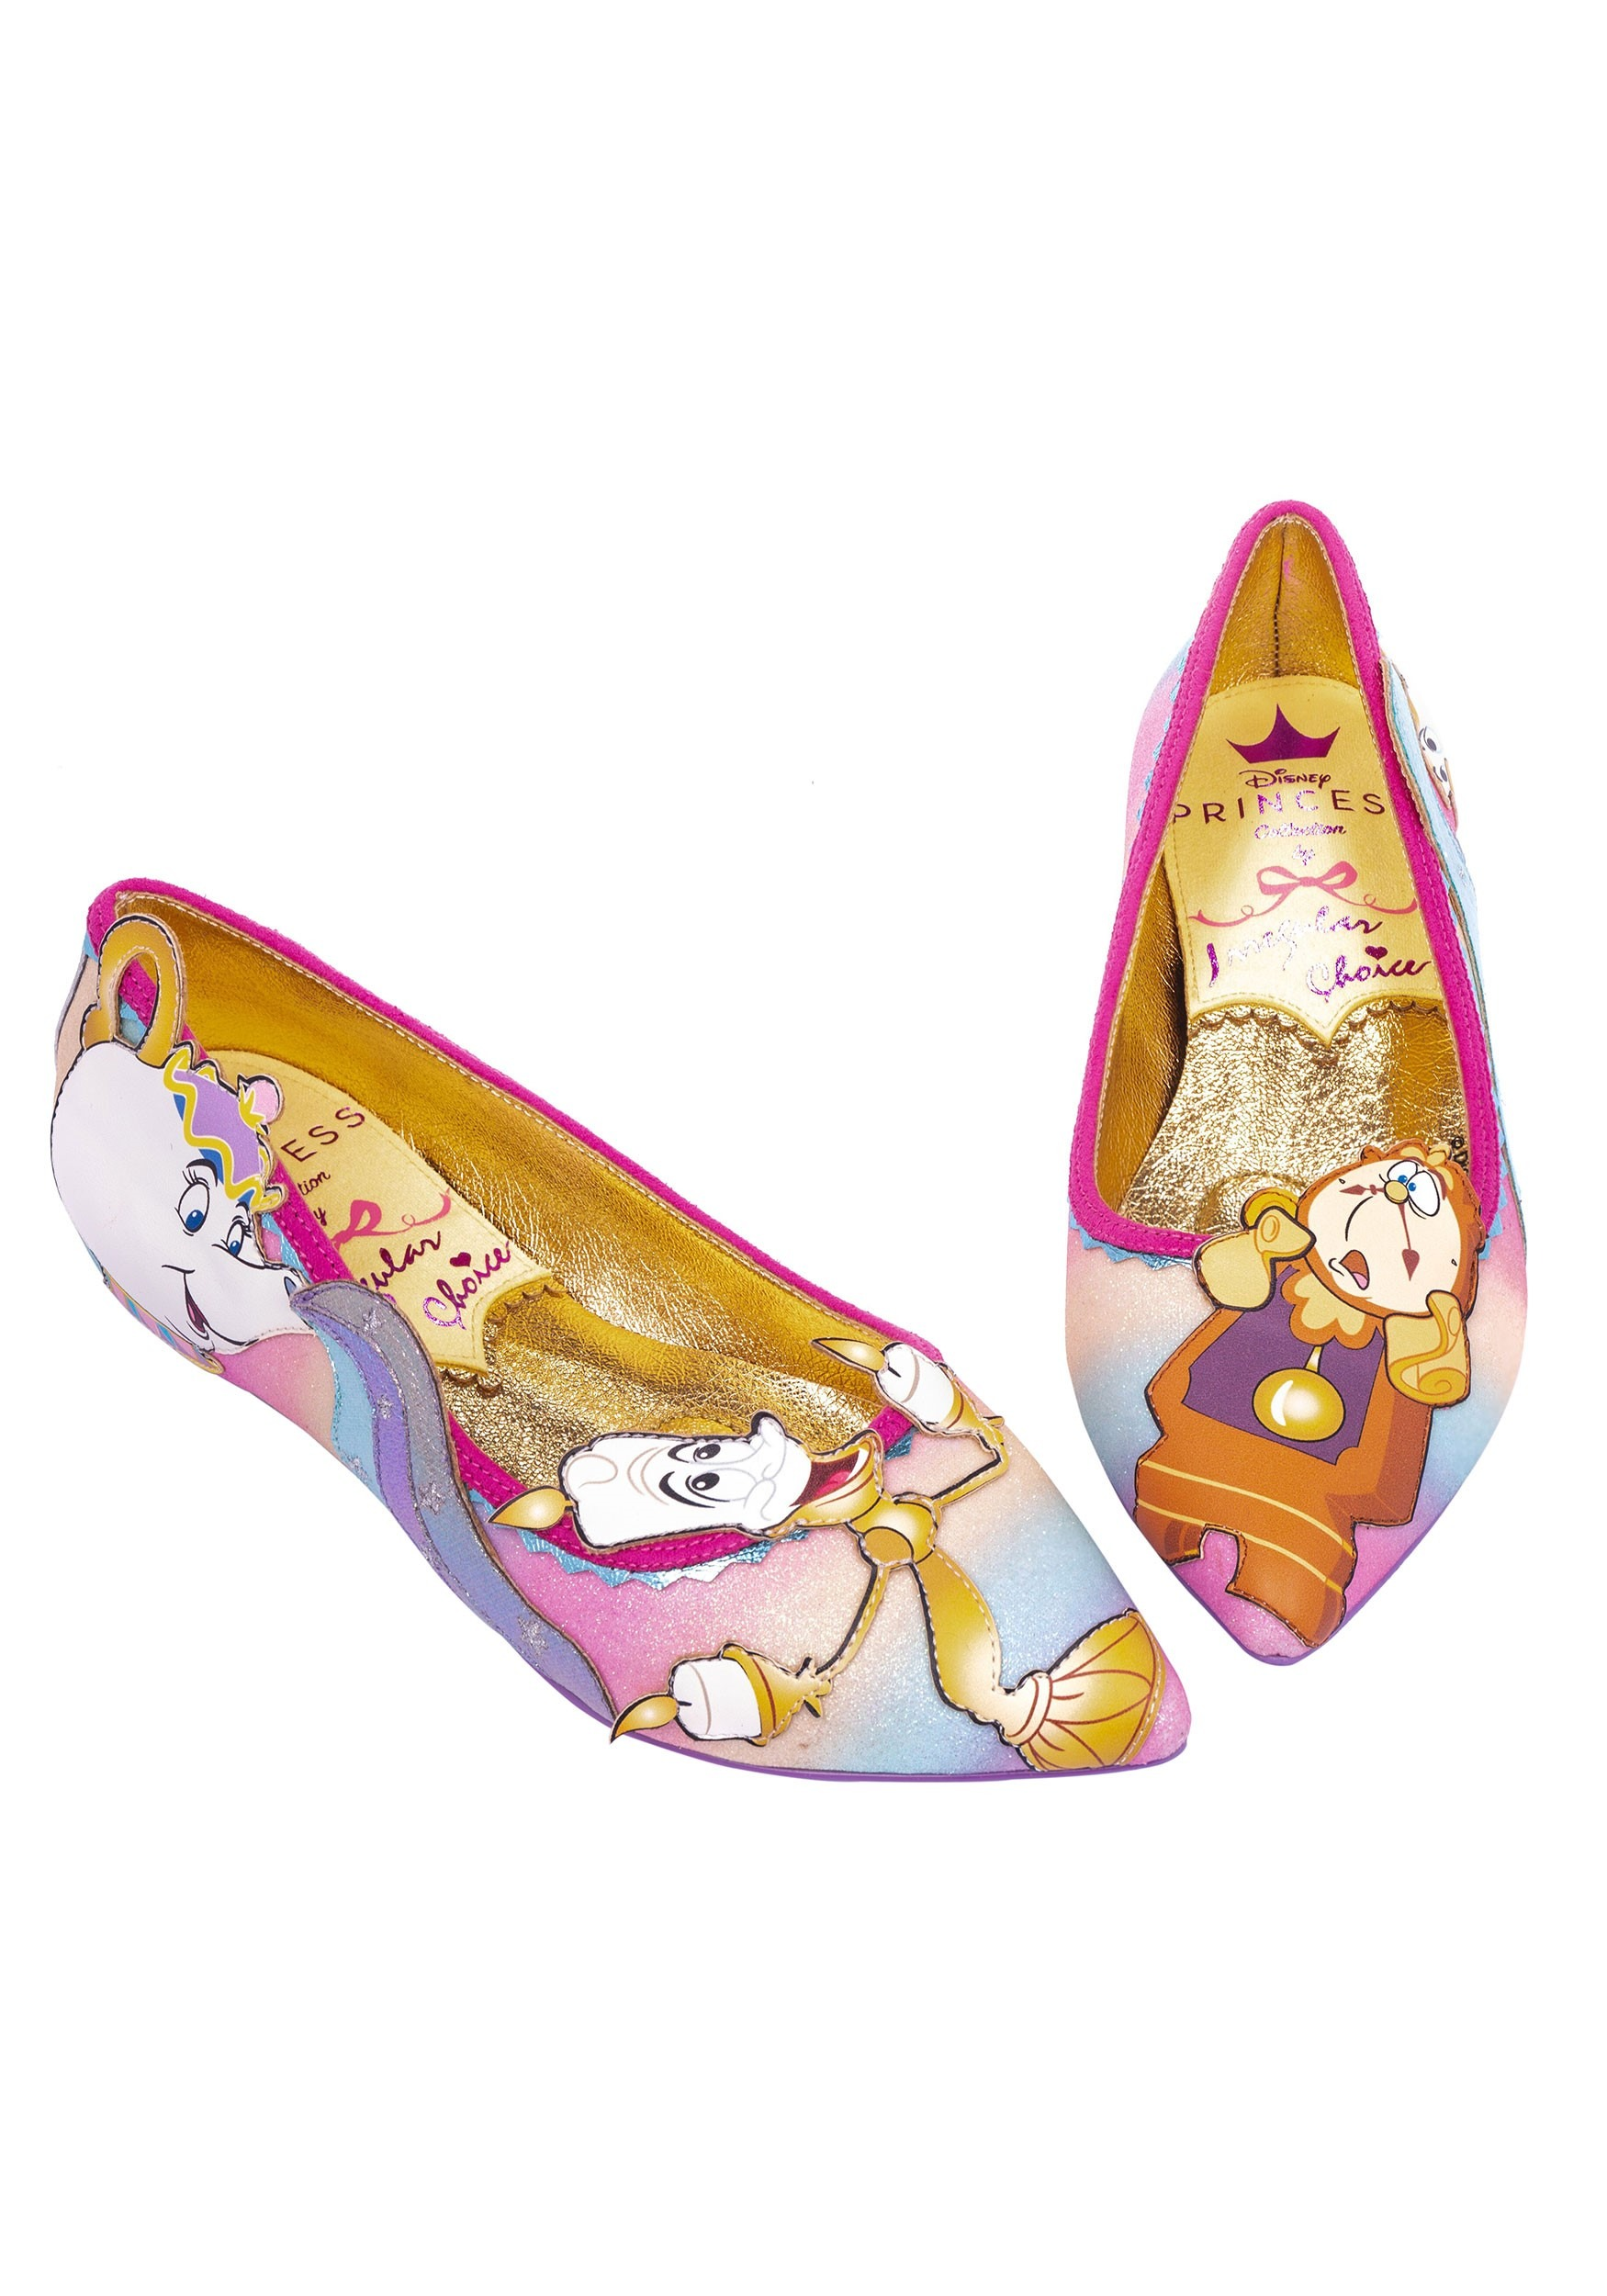 the Beast Flats Shoes Irregular Choice